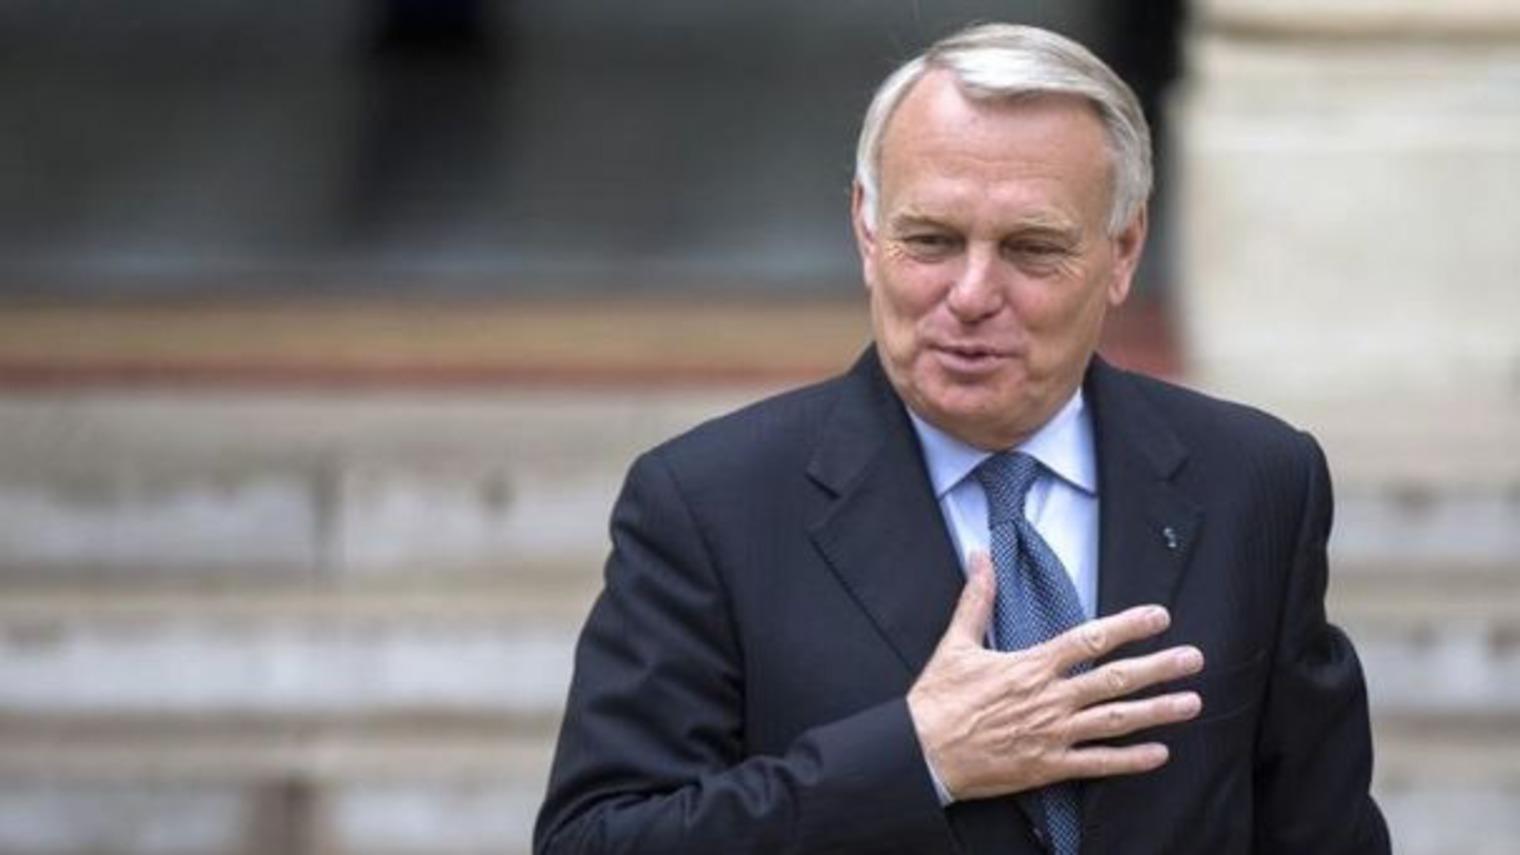 France - Sénégal: Jean-Marc Ayrault à Dakar ce jeudi